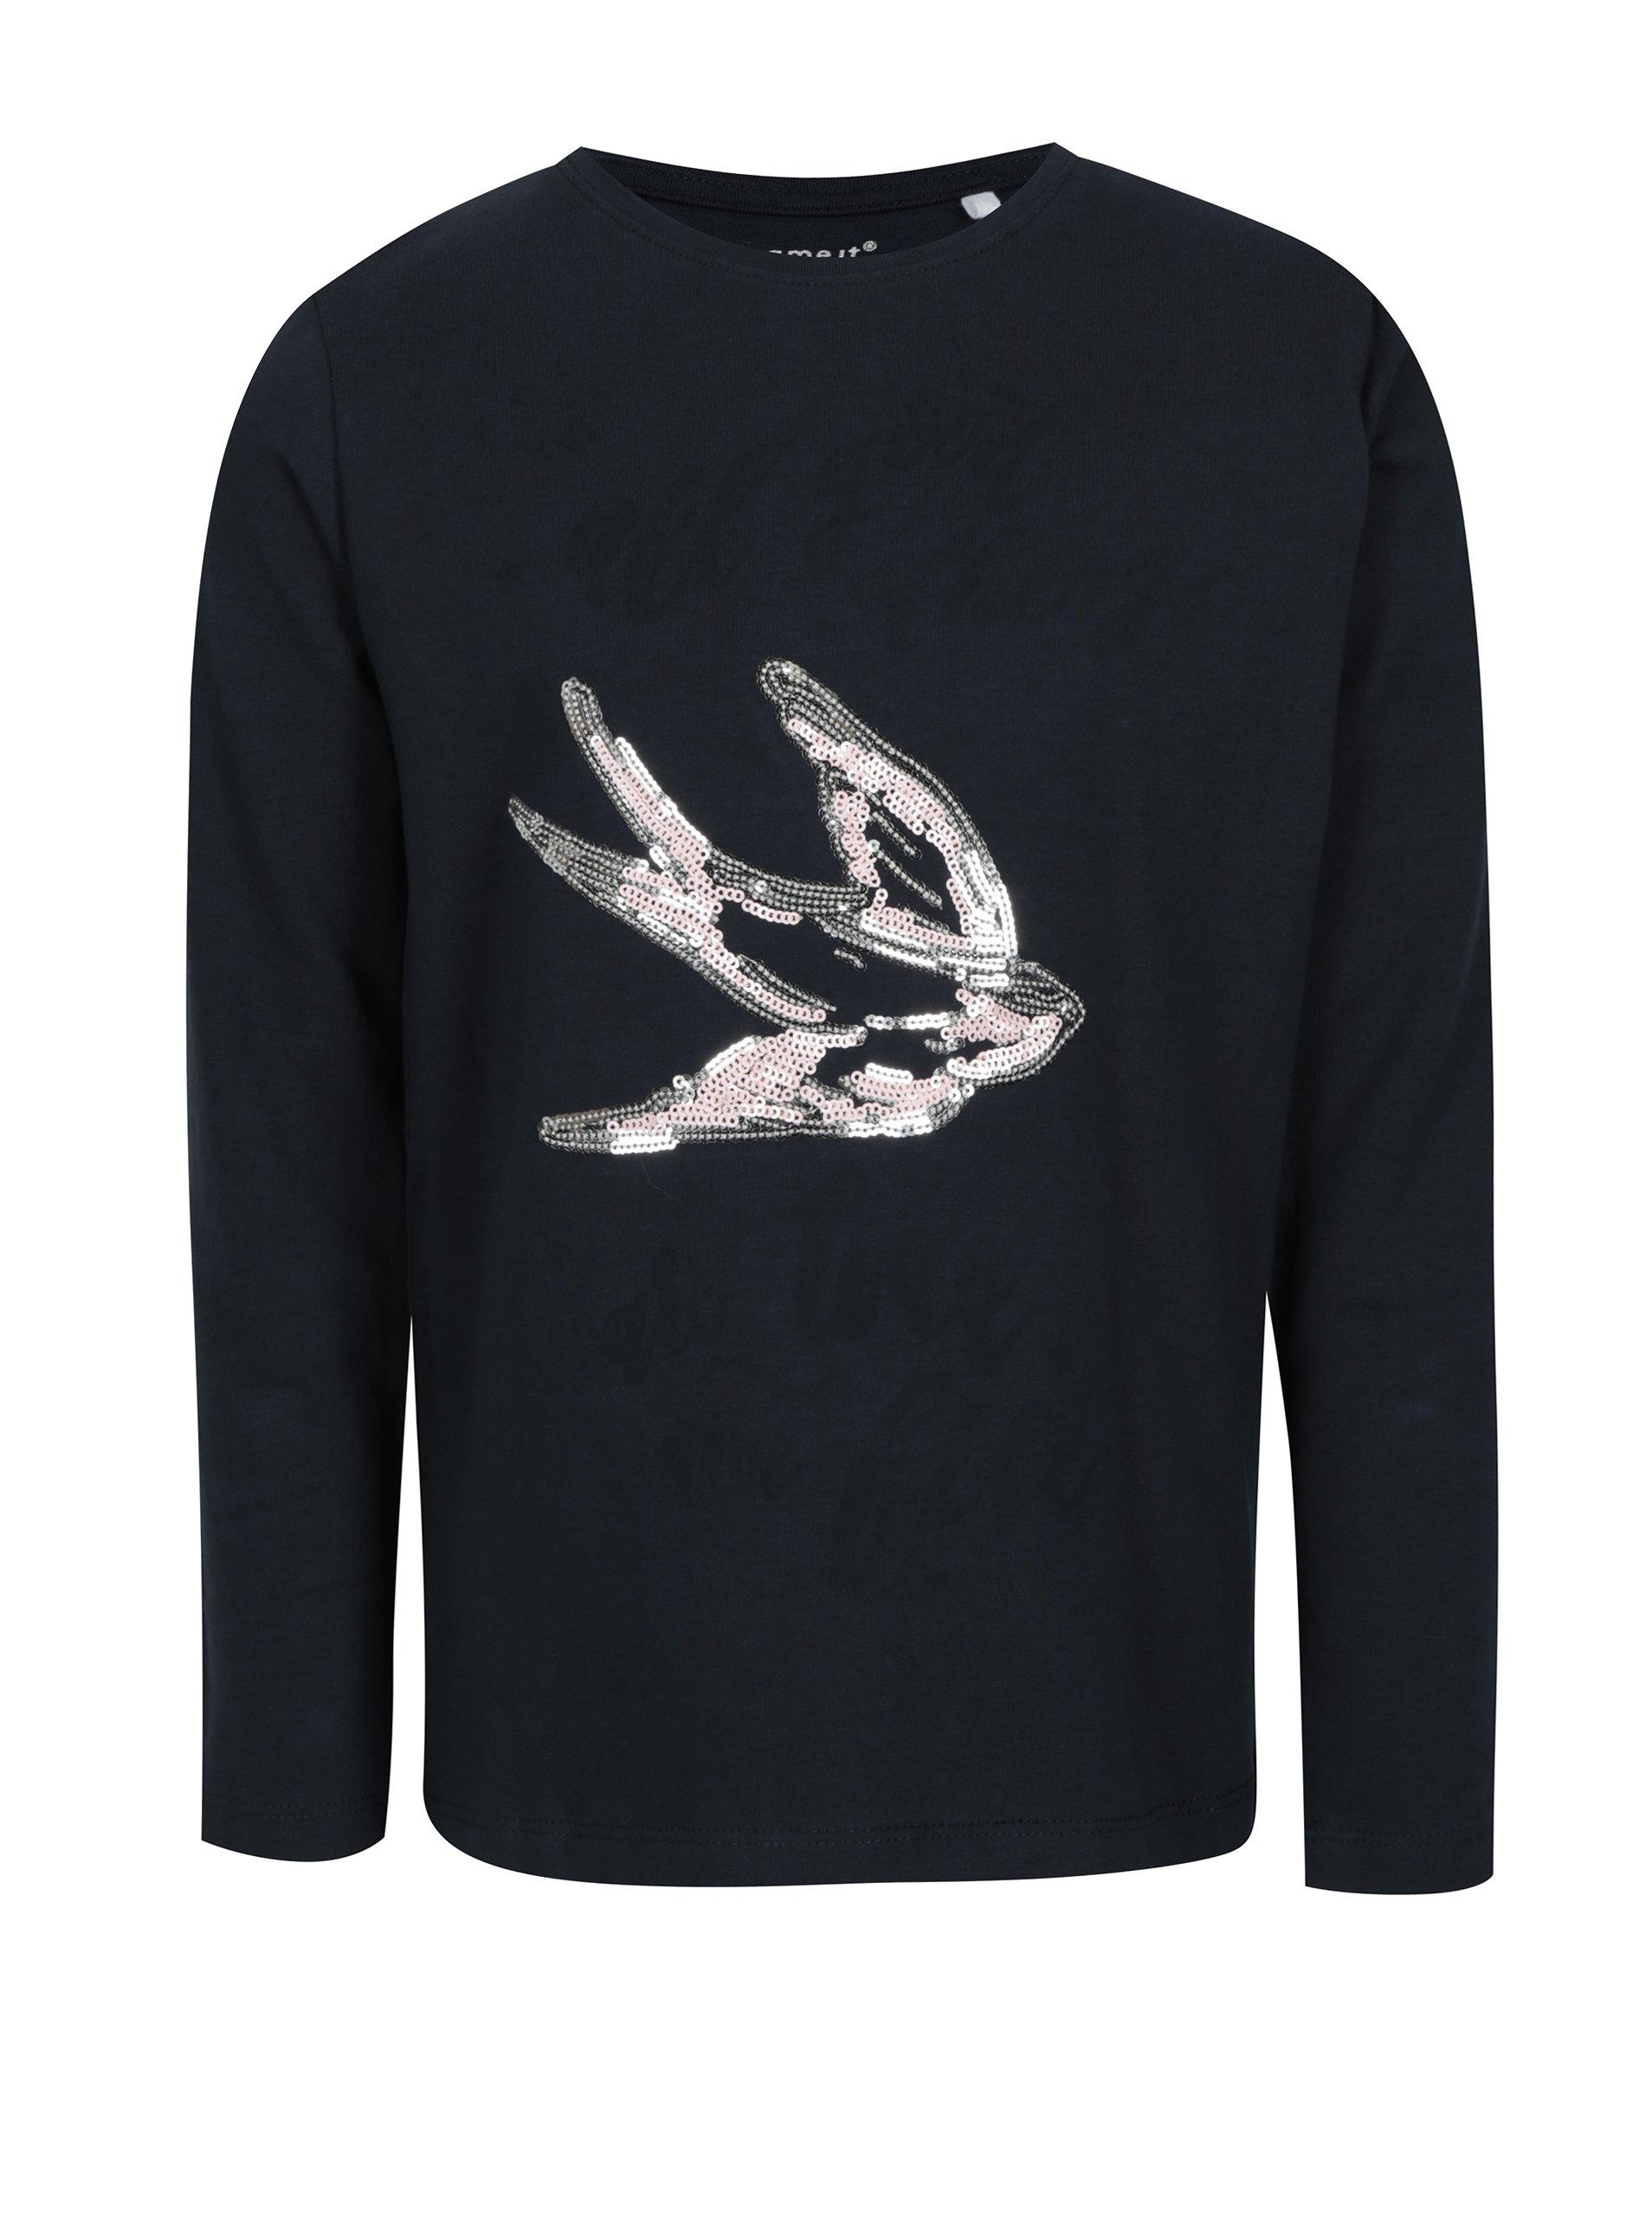 8e03157b5e3 Tmavě modré holčičí tričko s motivem vlaštovky name it Kannas Holky   Topy